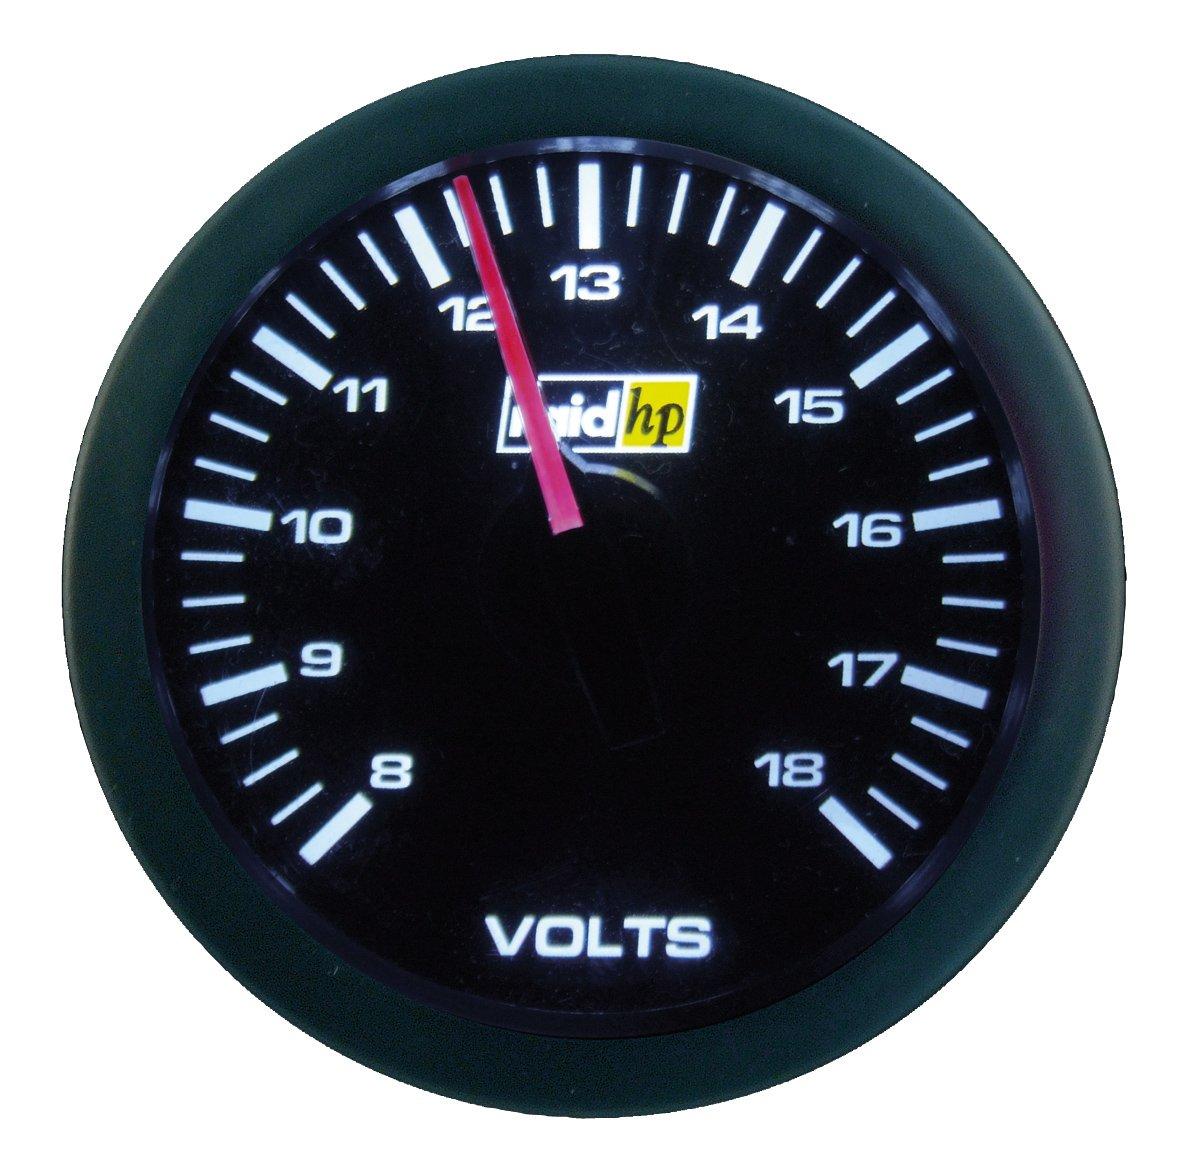 Raid hp 660179 Sport - Voltí metro